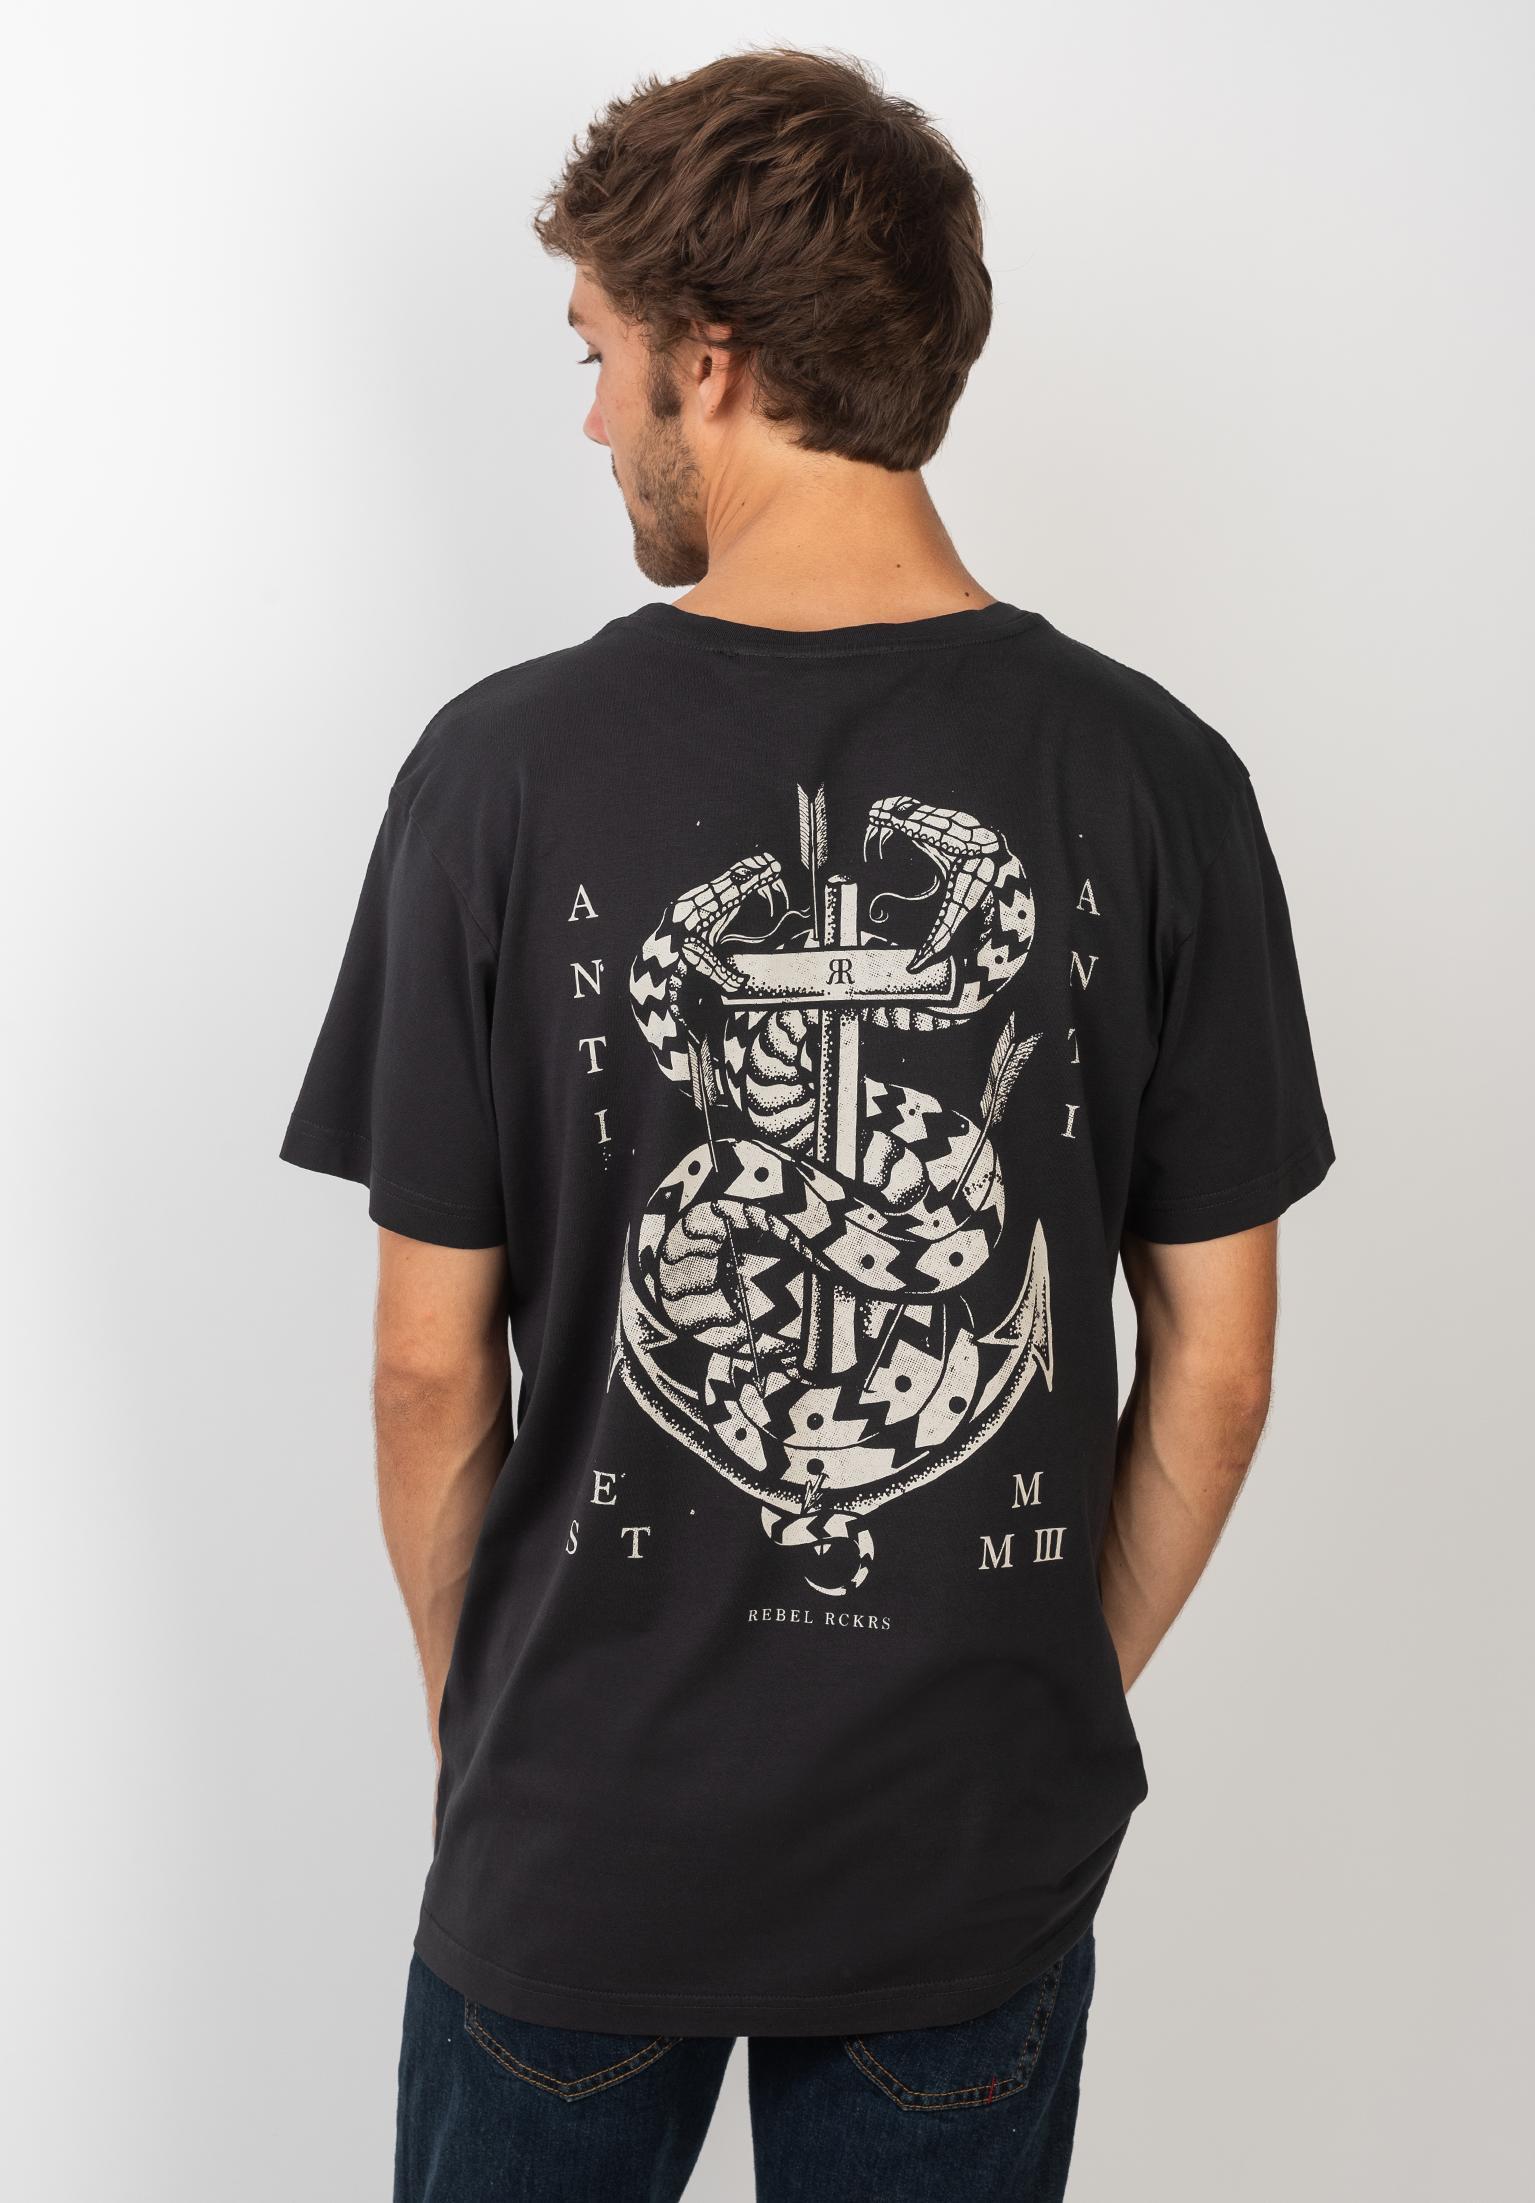 a5239d0889943 Herren T-Shirts Streetwear & Skate T-Shirts | titus.de | Titus